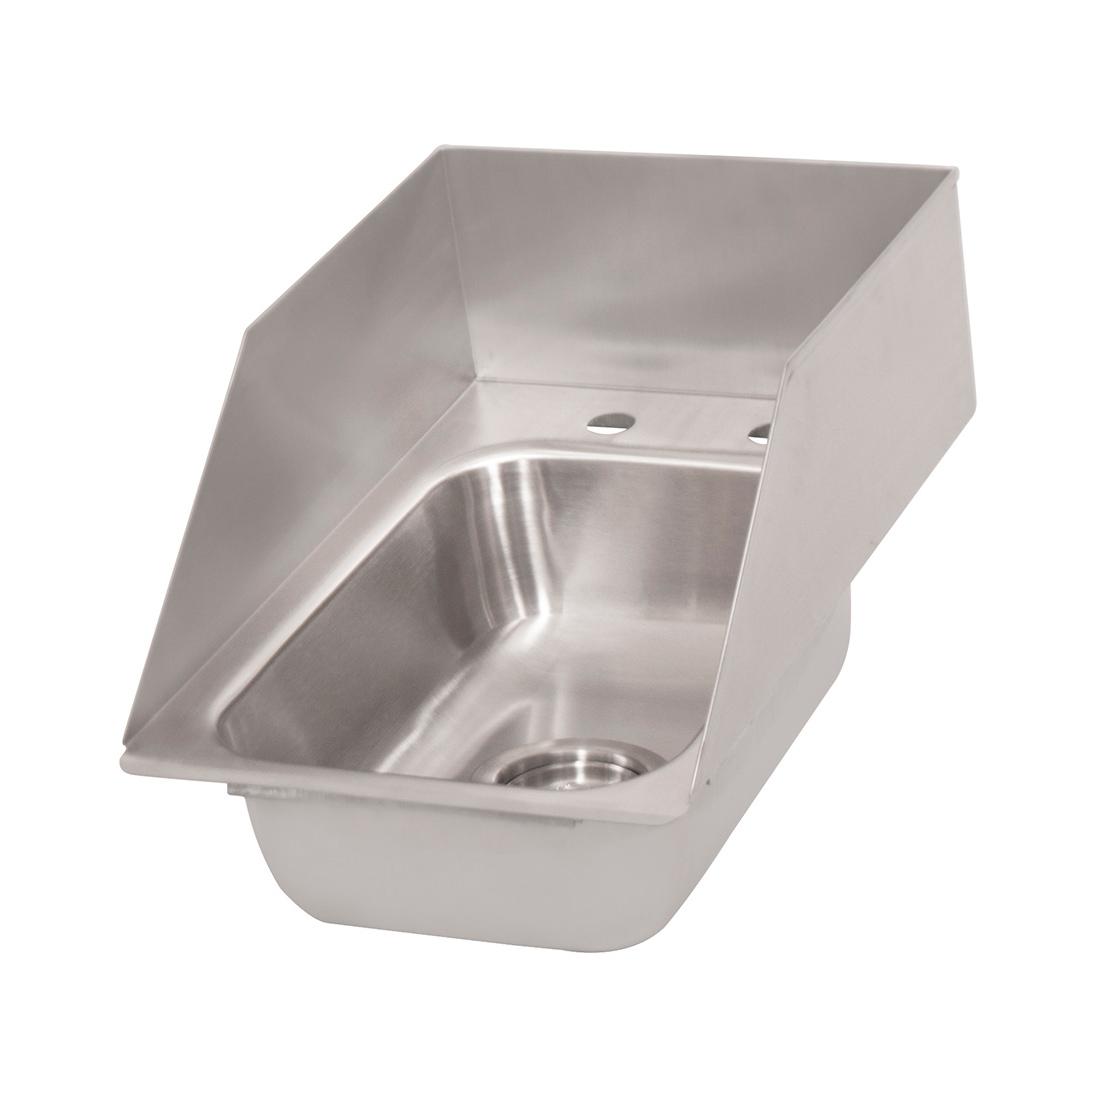 BK Resources DDI-1014524S sink, drop-in